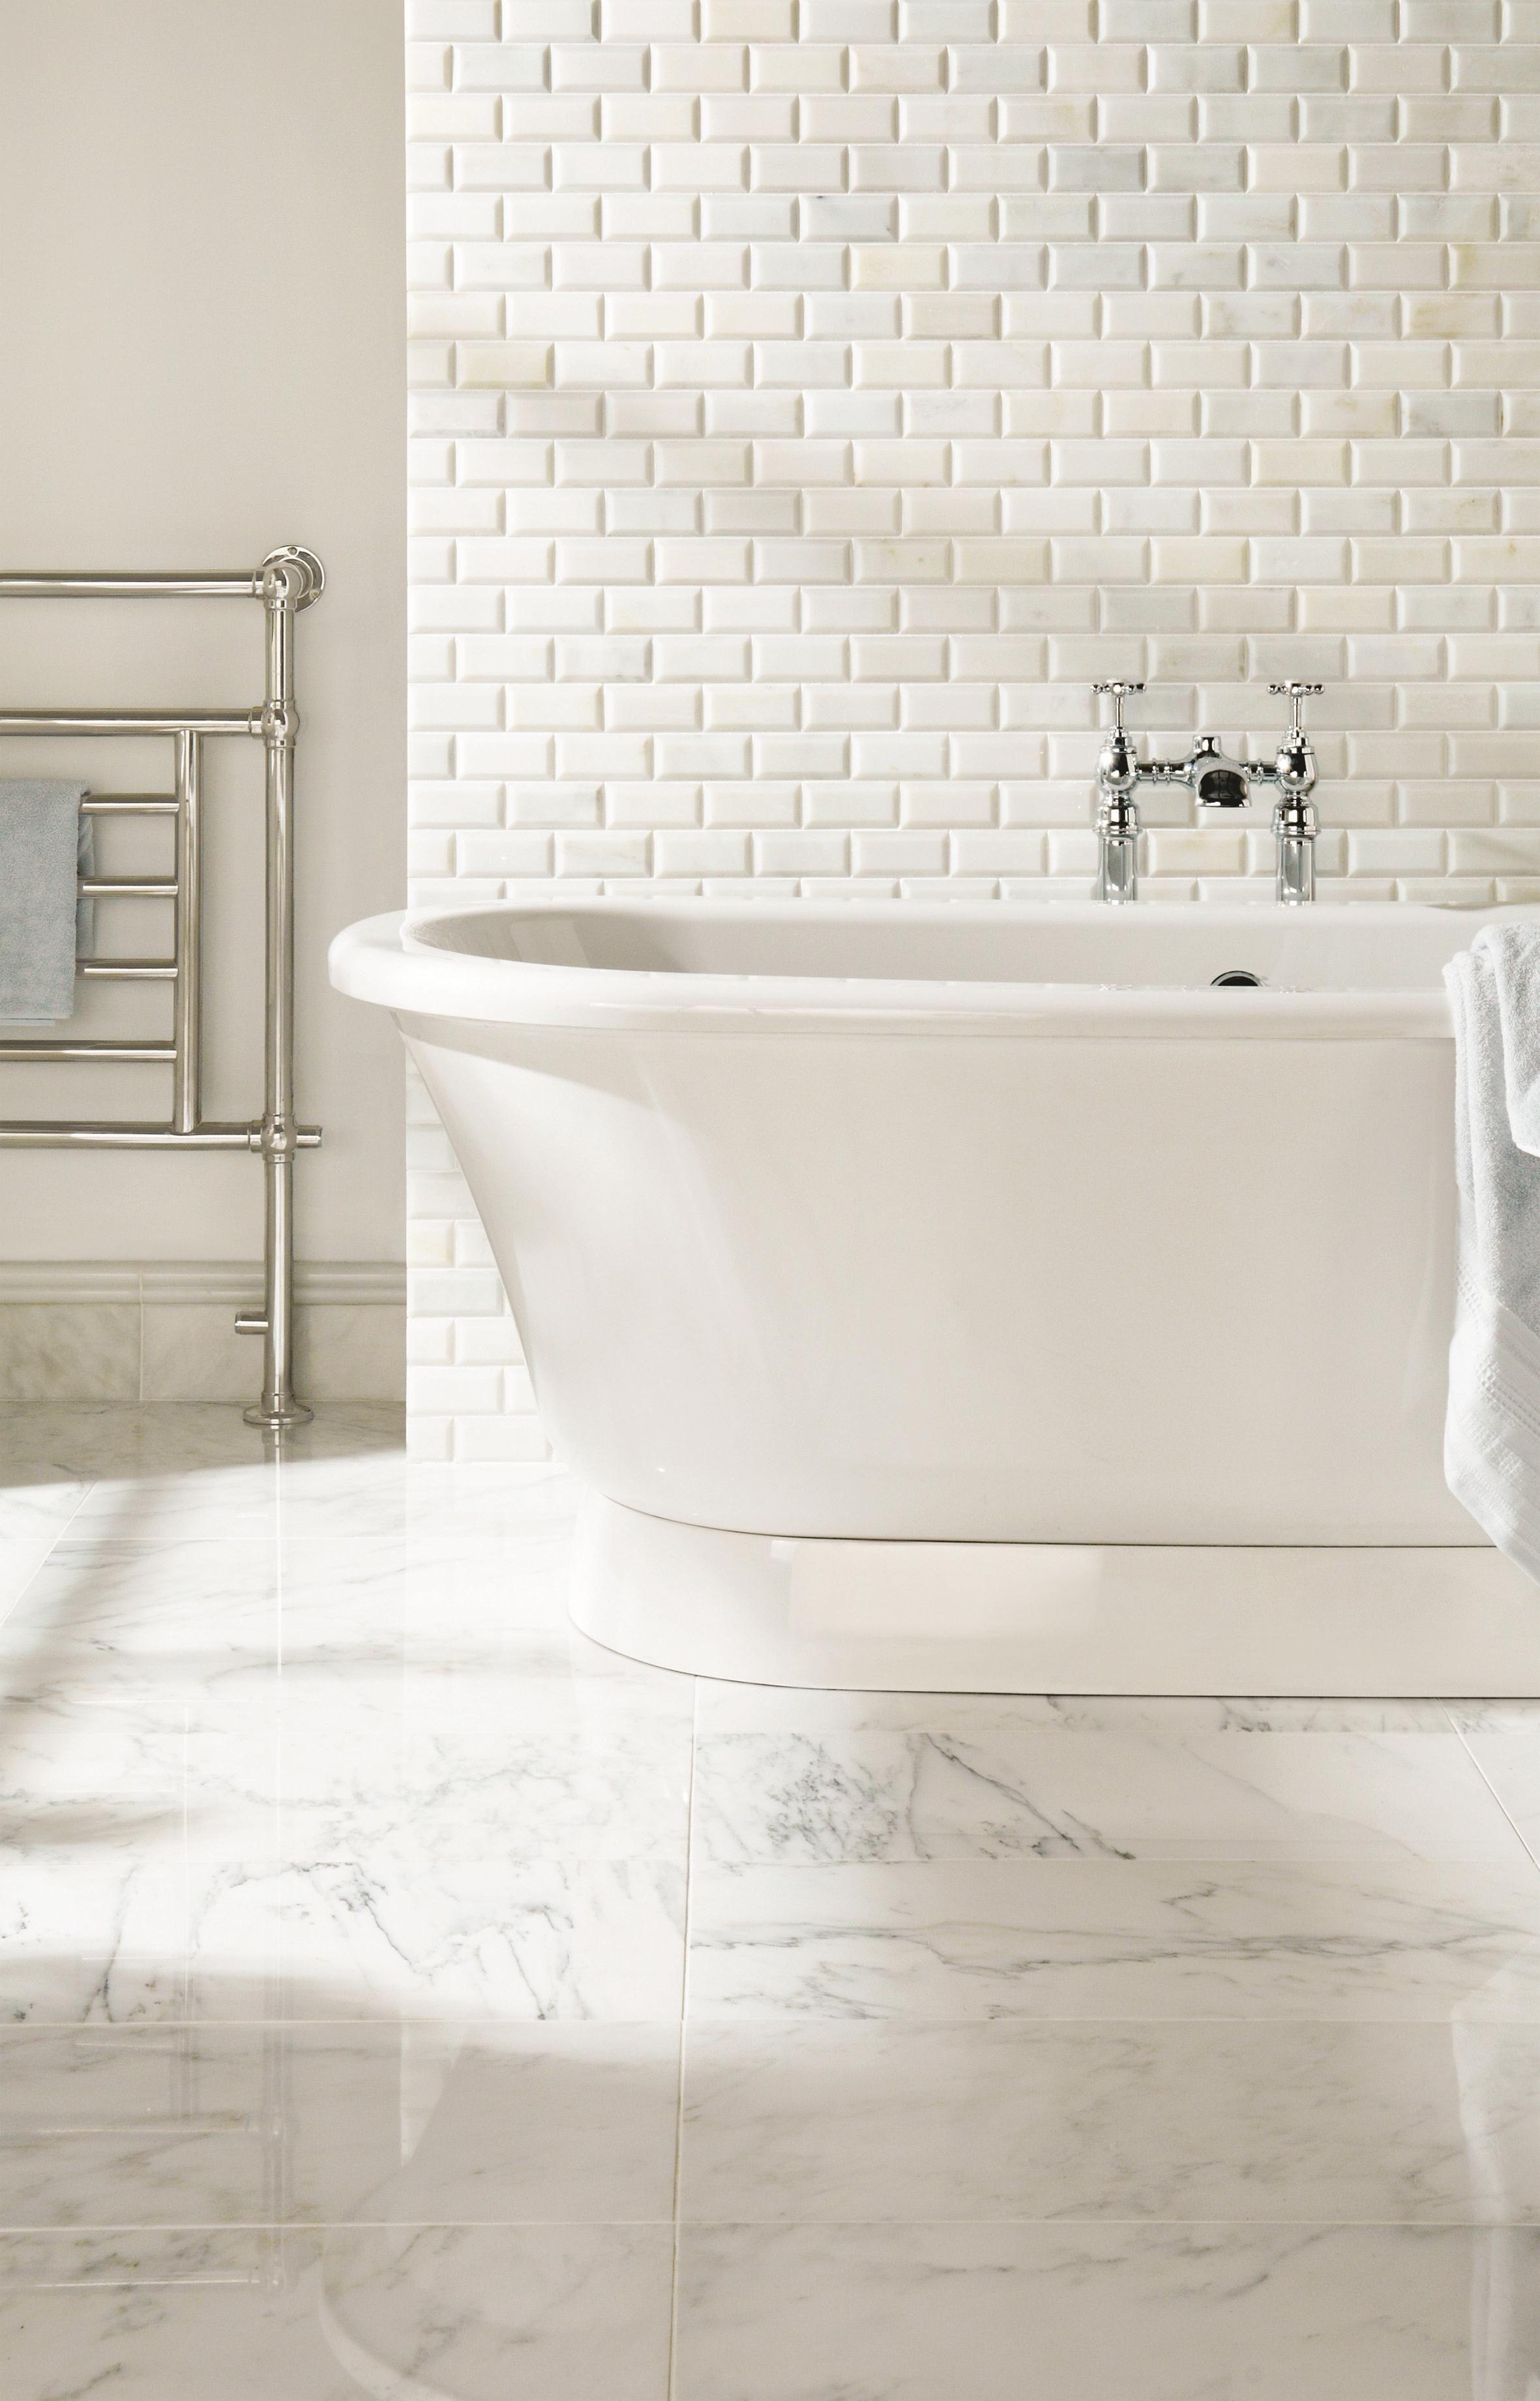 40 Nice Bevelled Tiles Pattern Decortez Marble Bathroom Floor Marble Bathroom Subway Tiles Bathroom